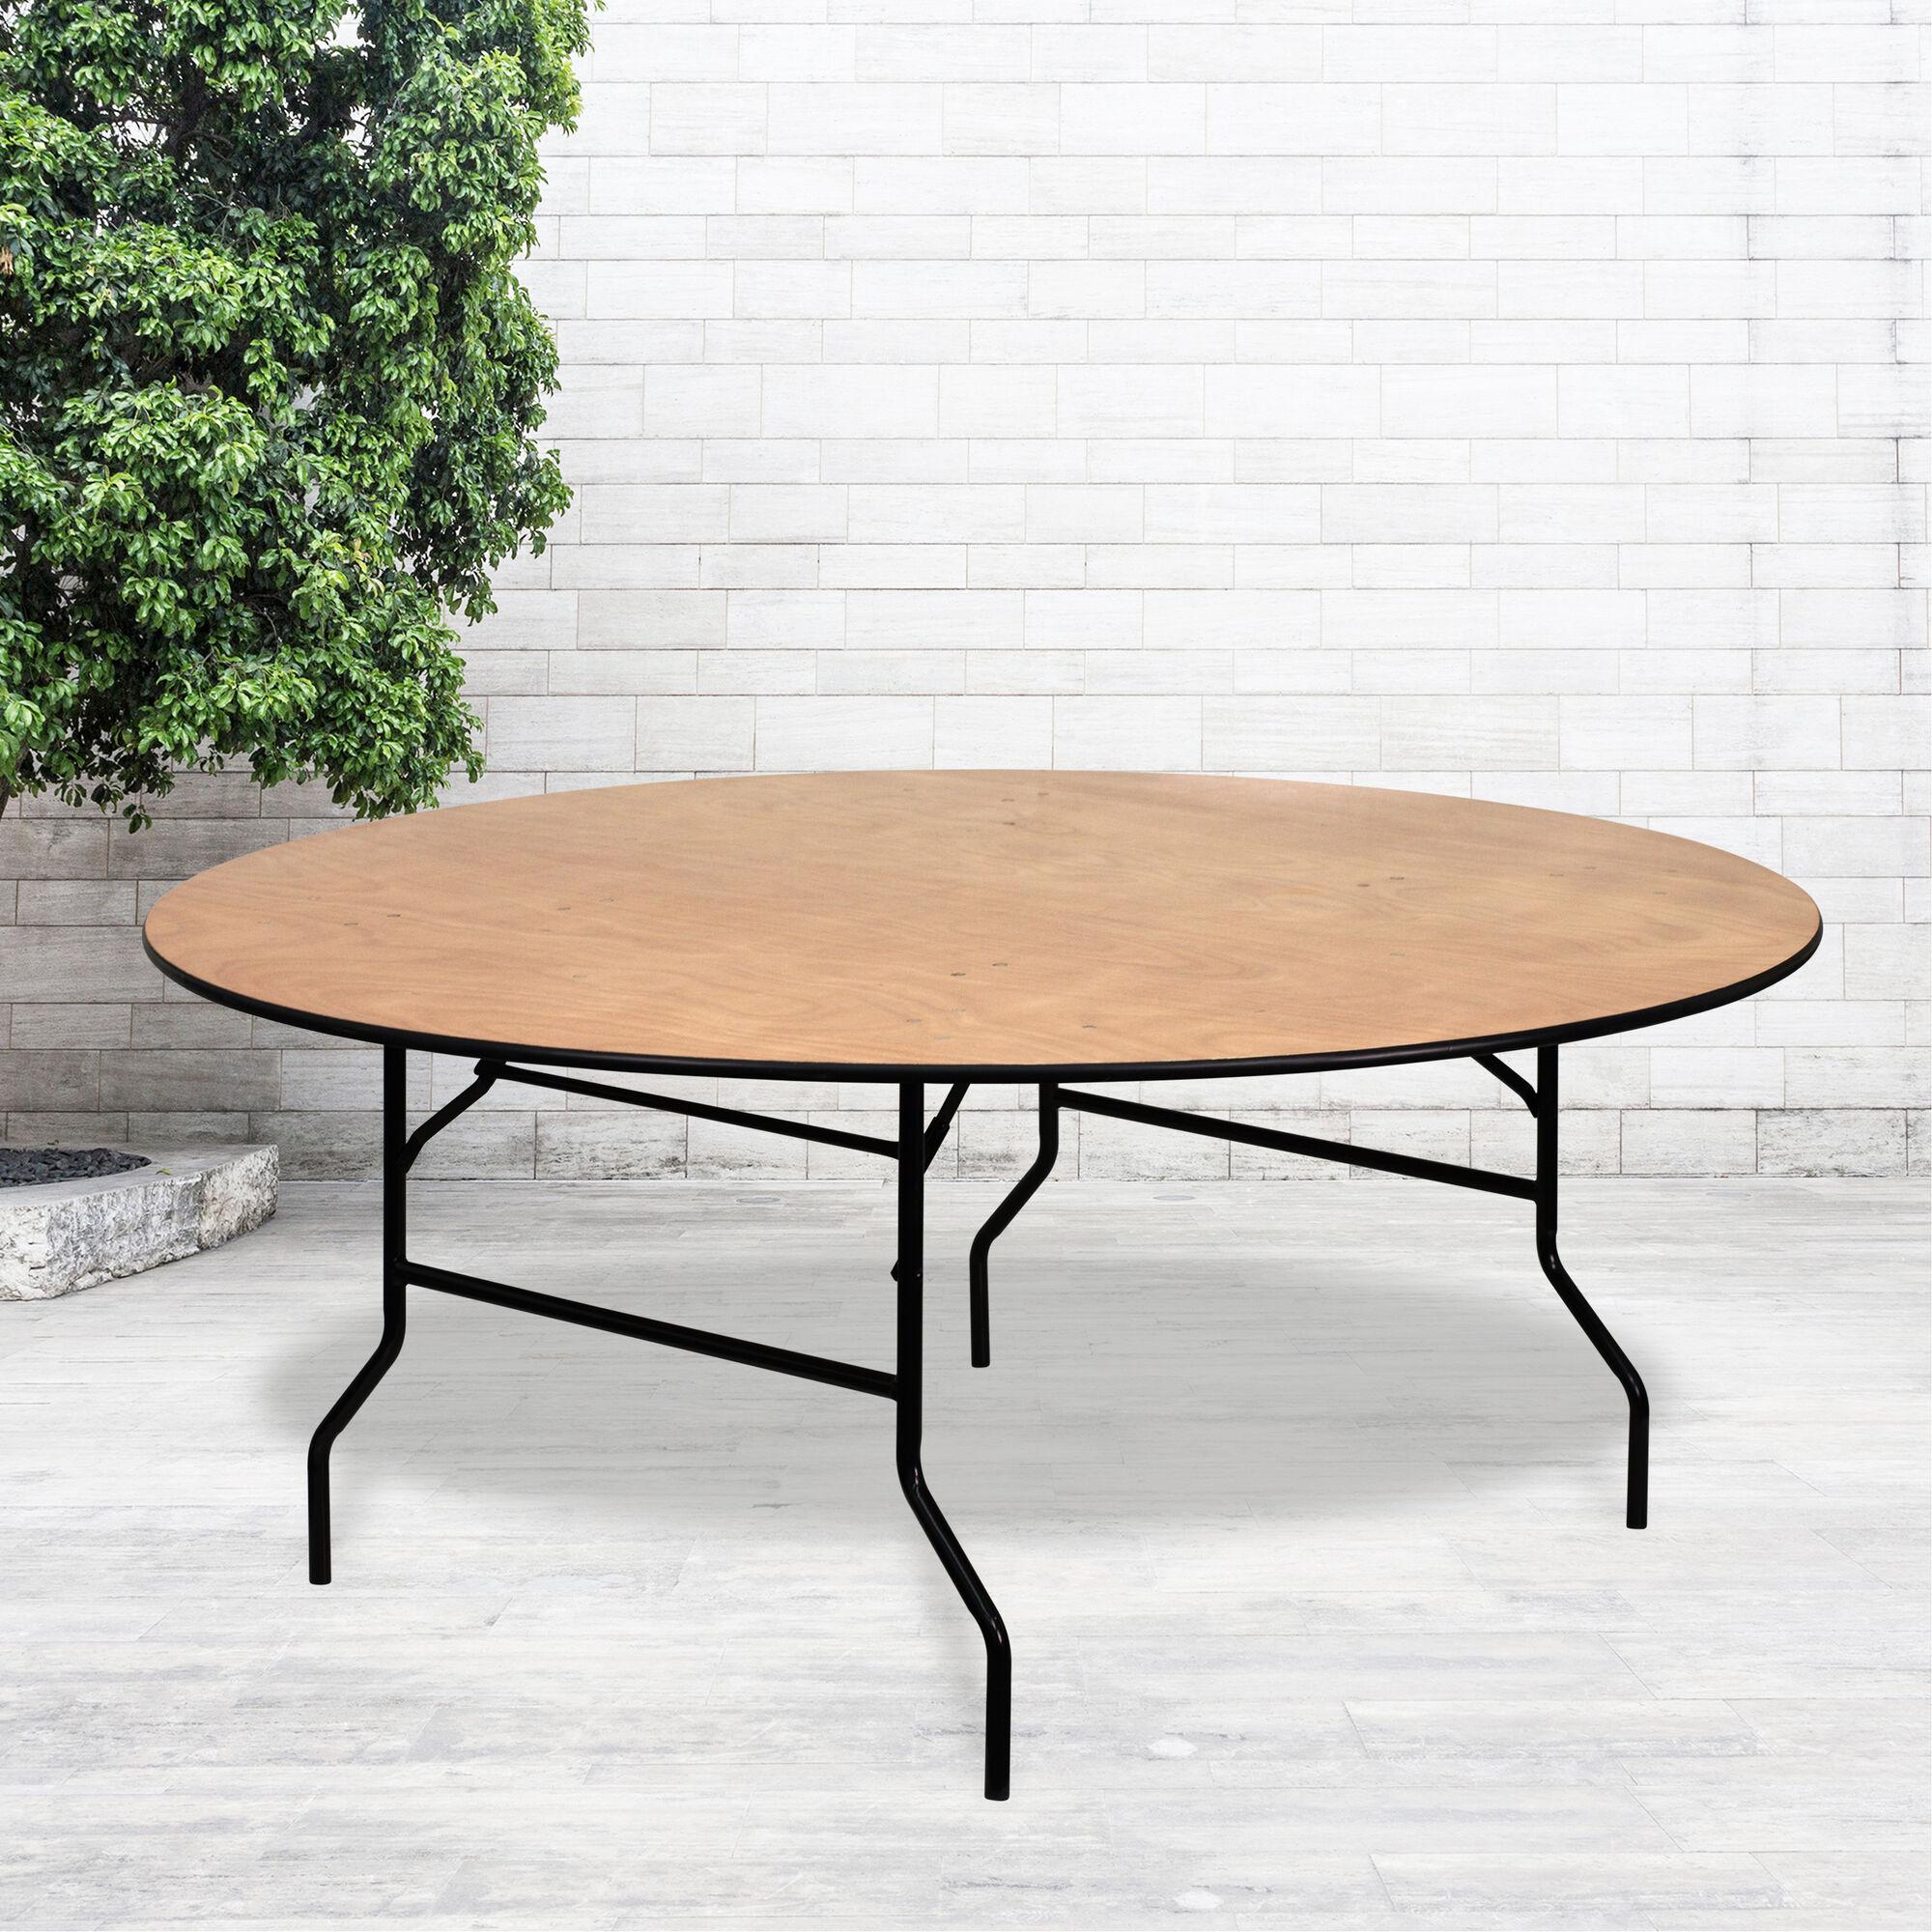 72rnd Wood Fold Table Yt Wrft72 Tbl Gg Foldingchairs4less Com